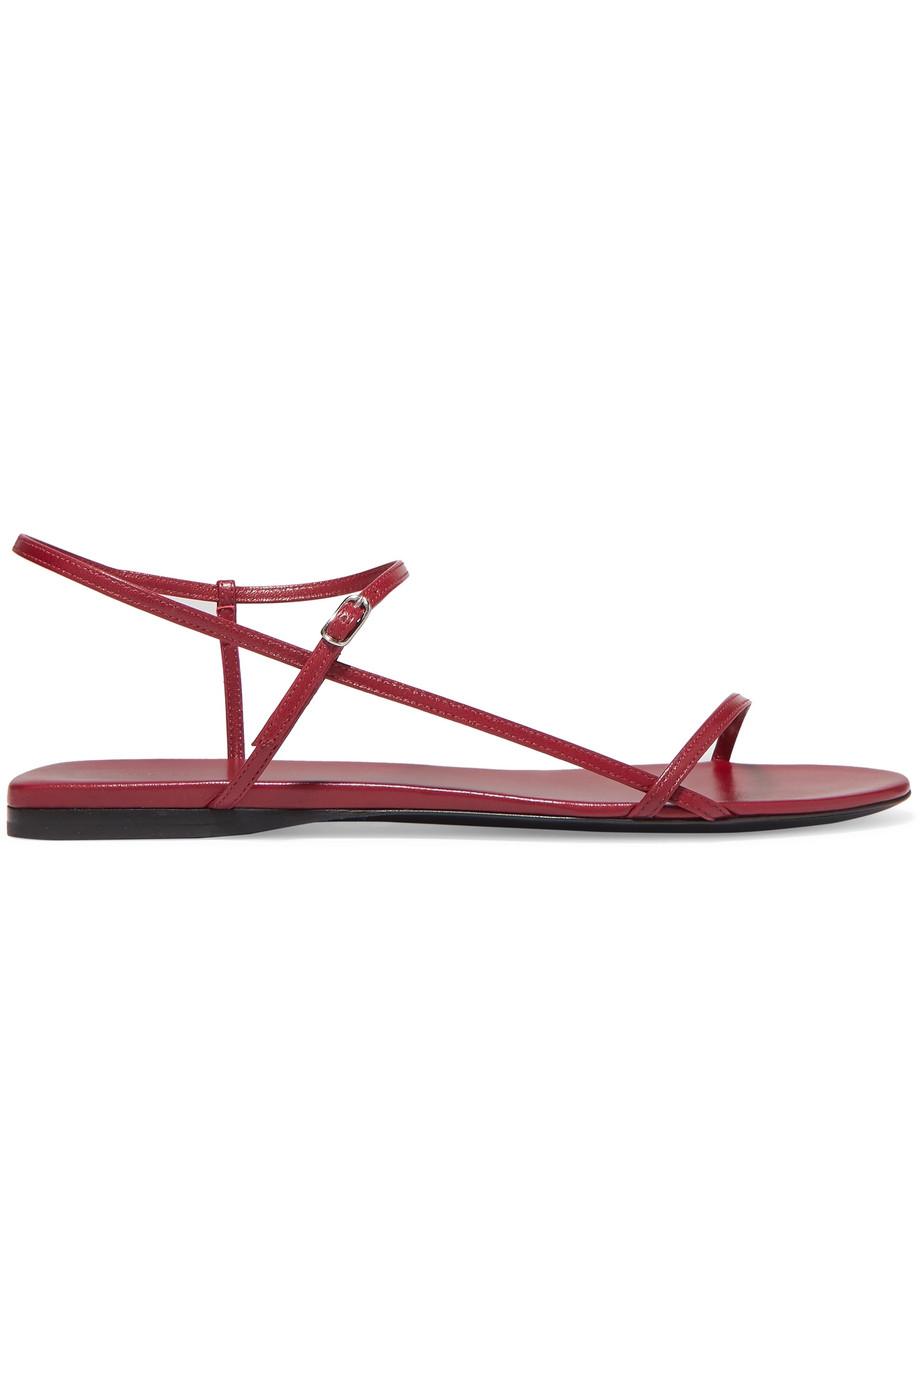 The_Row_Sandals_JLBABE.jpg